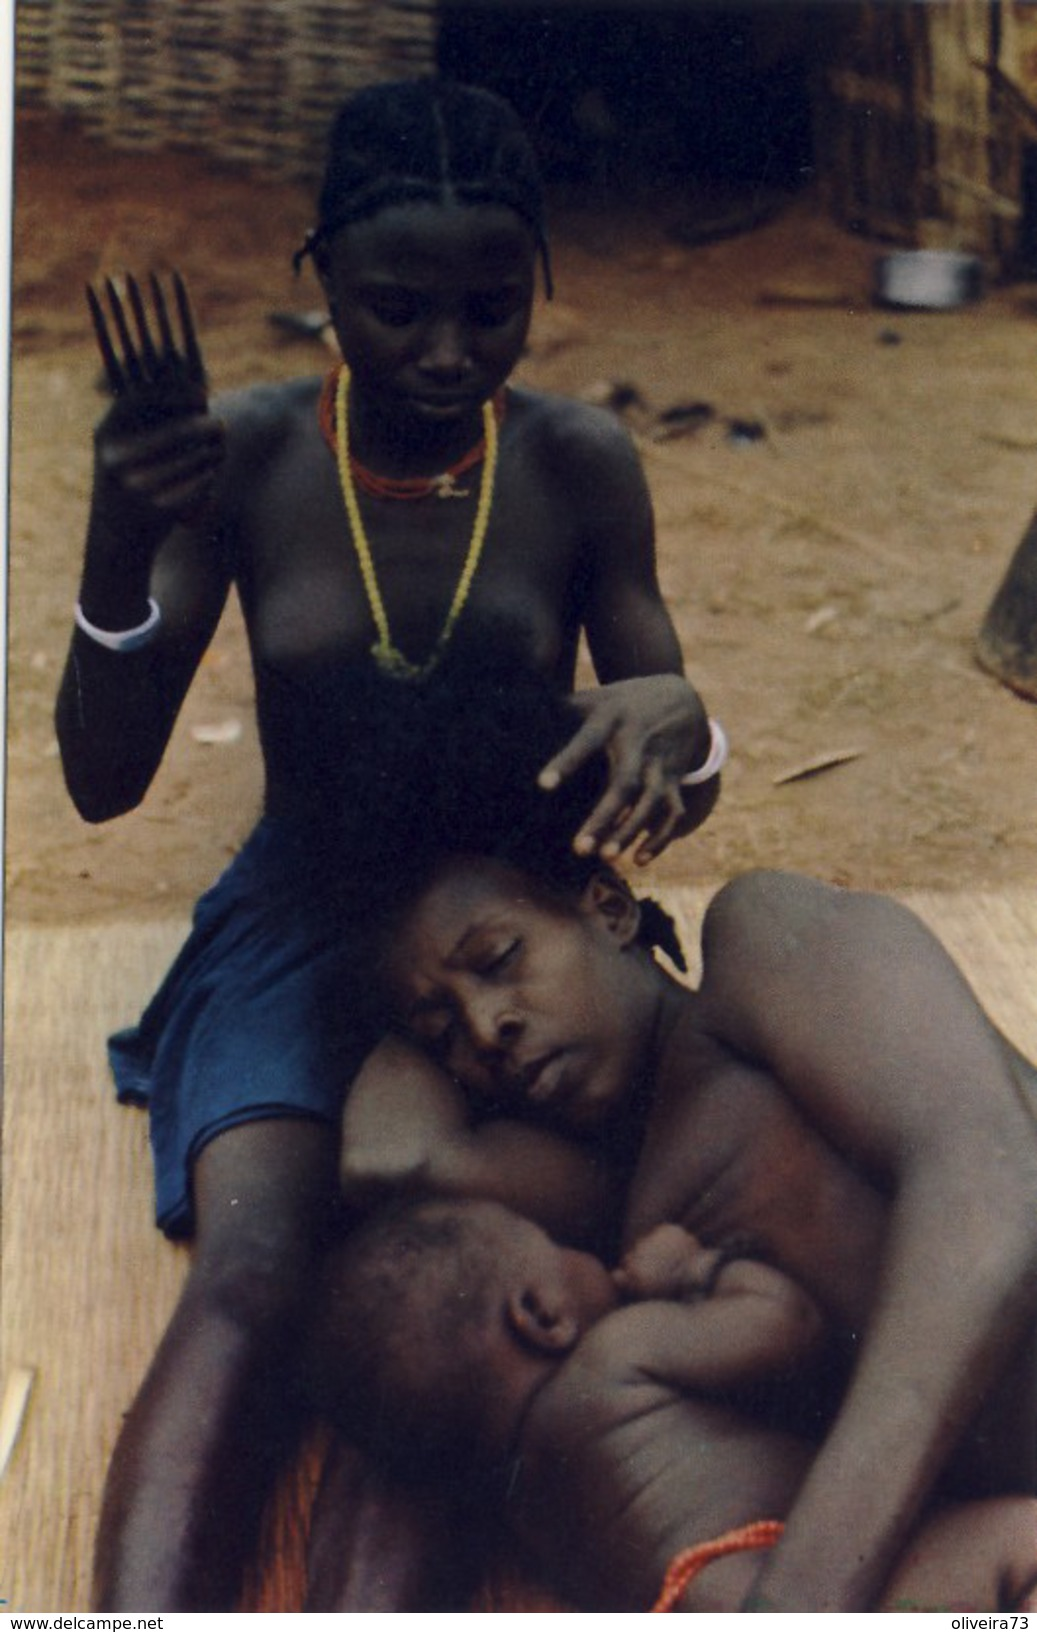 GUINÉ, BISSAU, Tecendo Cabelo (Beafadas) Fulacunda (NU, NUS), 2 Scans - Guinea-Bissau